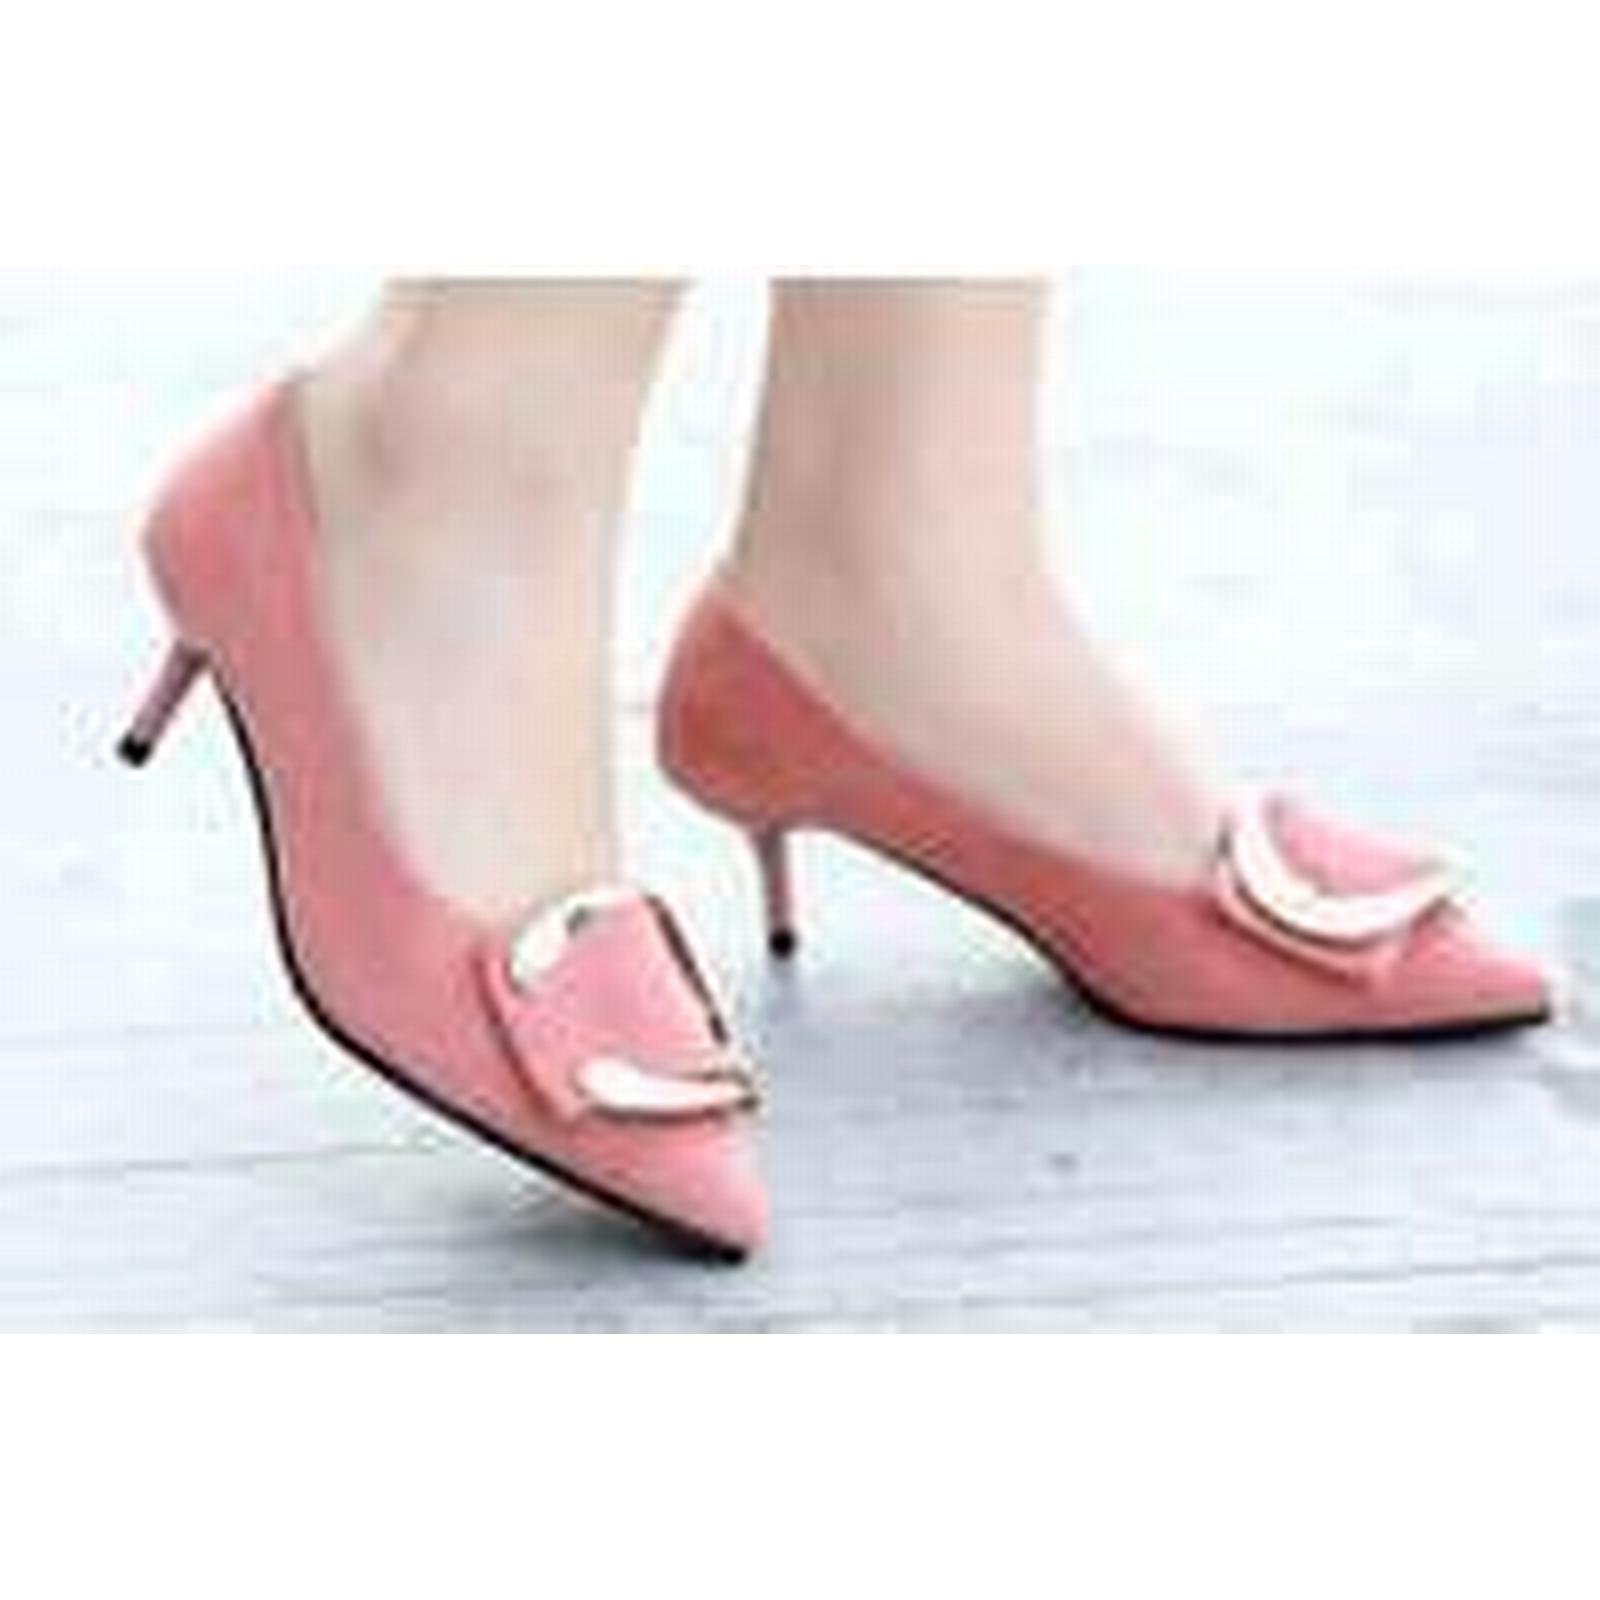 Bonanza (Global) US pp312 Elegant pointy pump w gold buckle, US (Global) Size 4-9.5 pink 3341fd